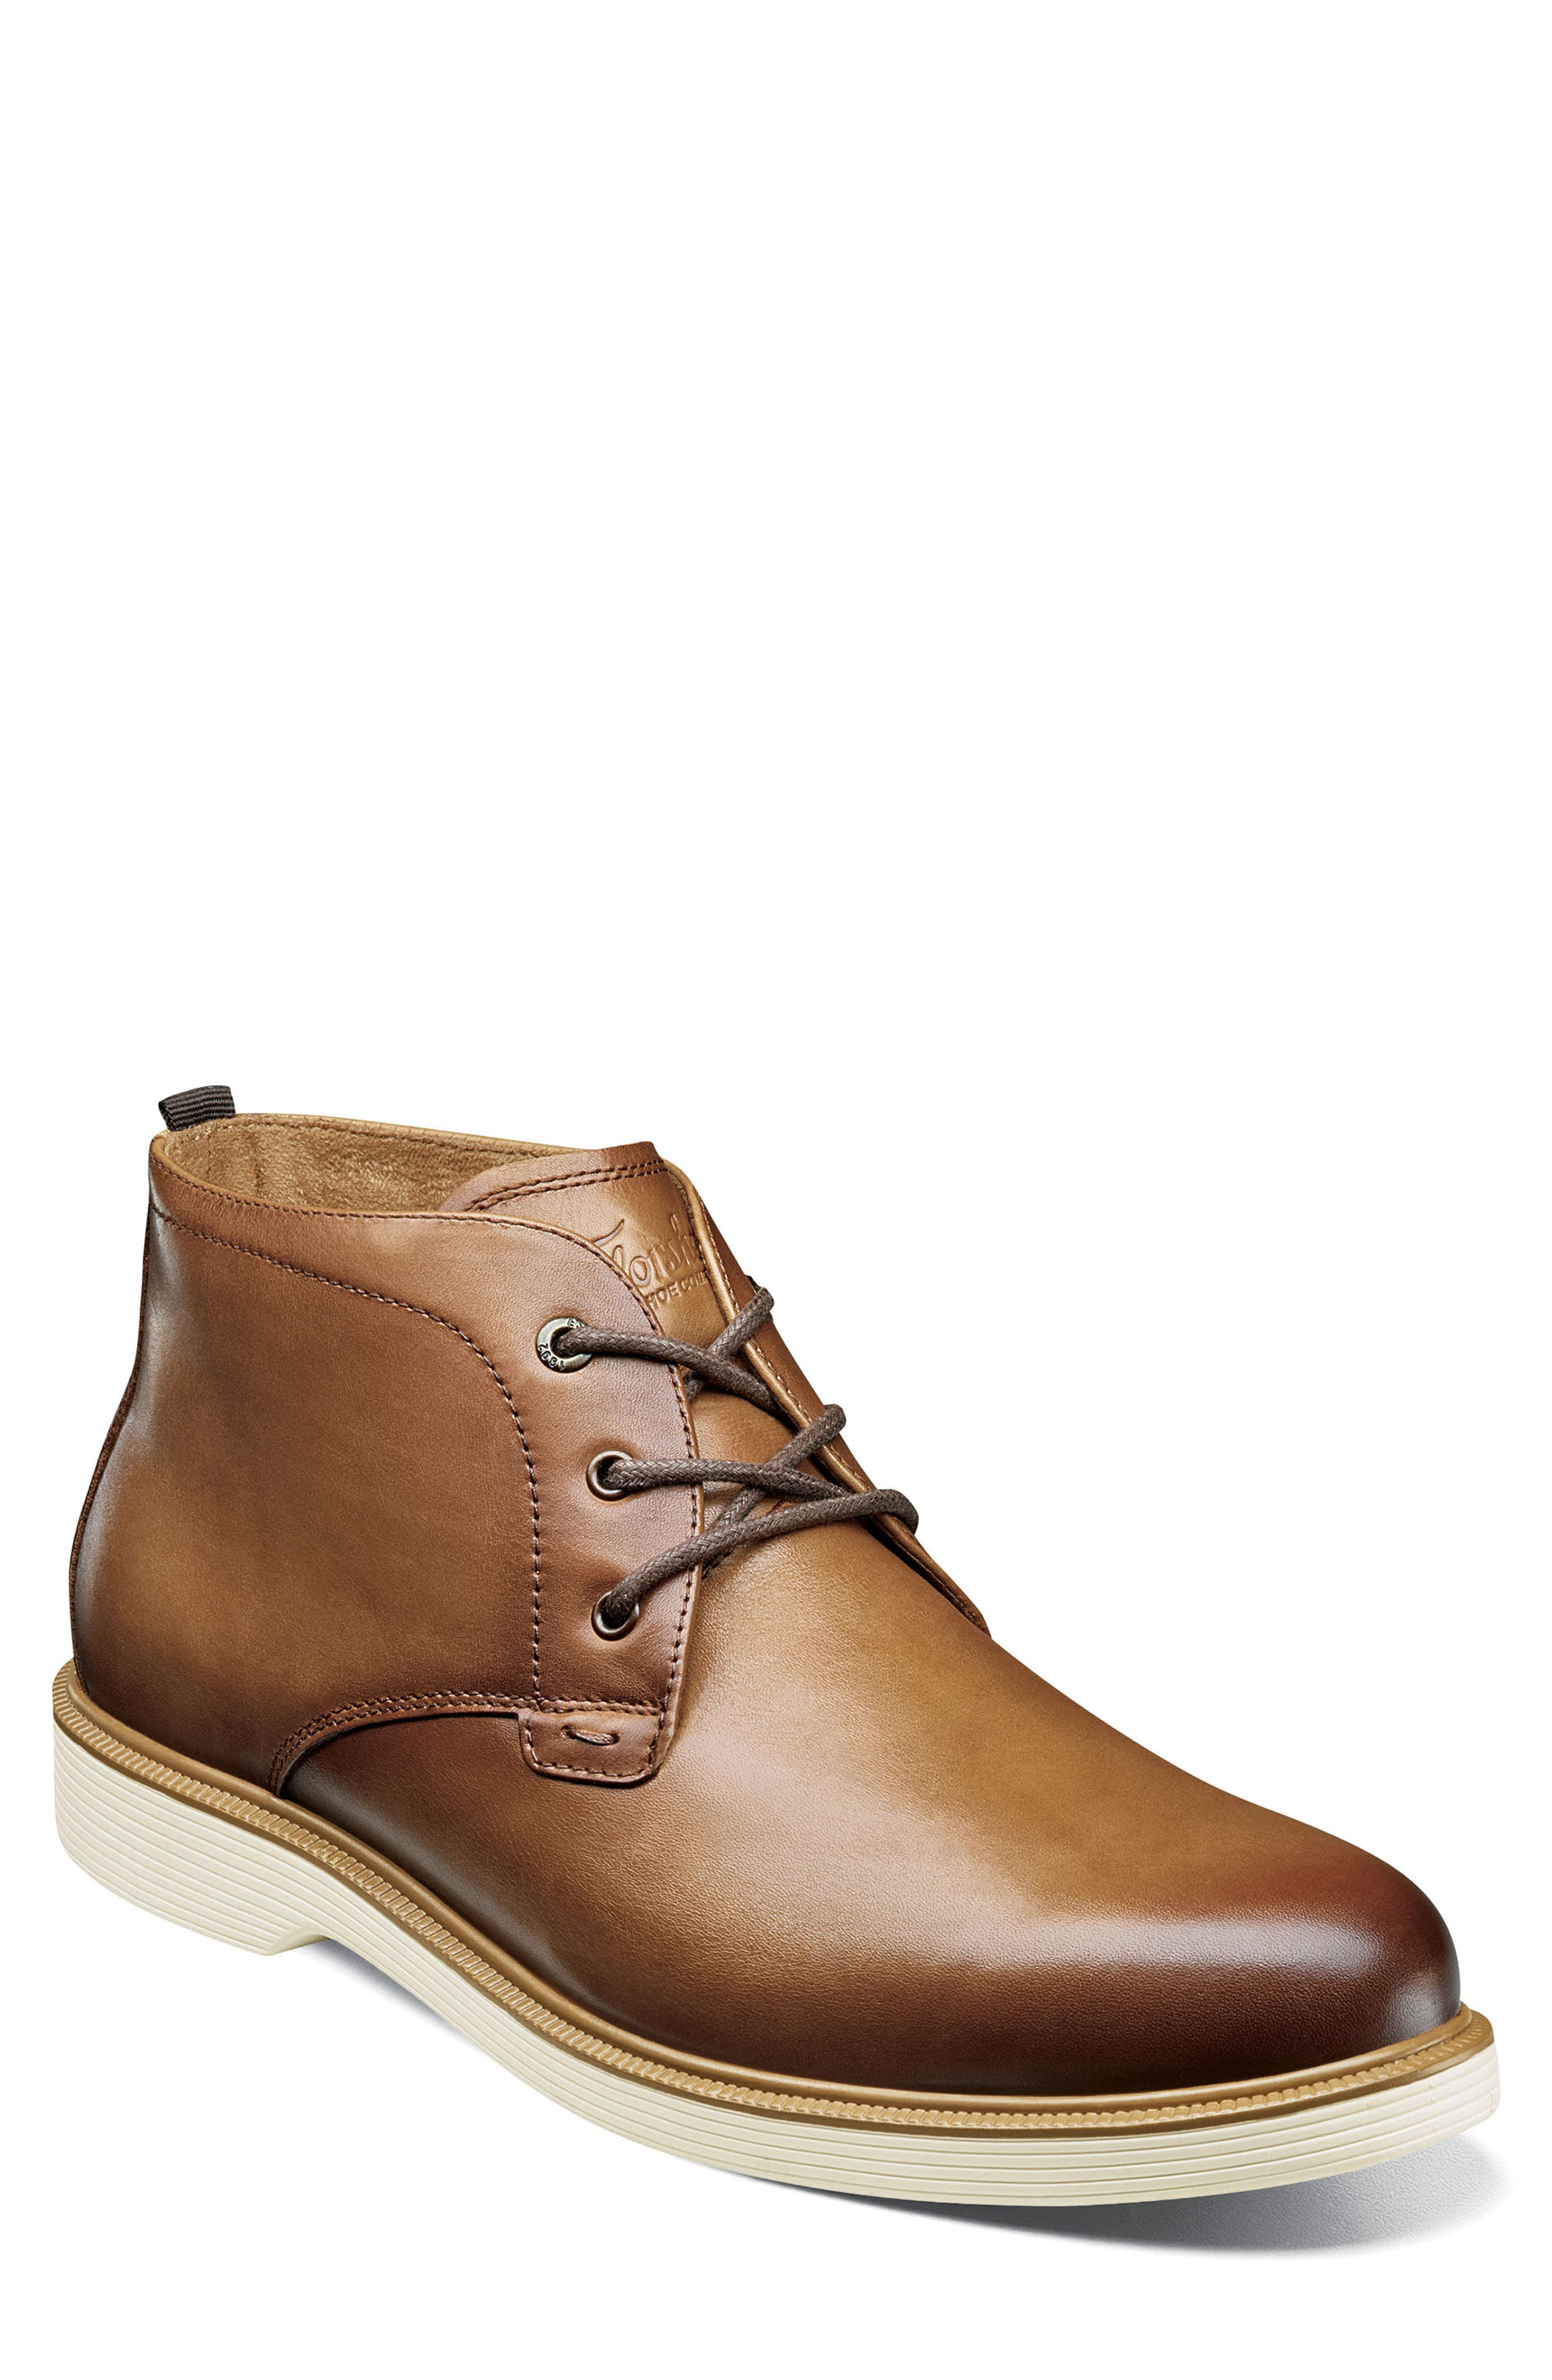 Image of Florsheim Supacush Plain Toe Leather Derby